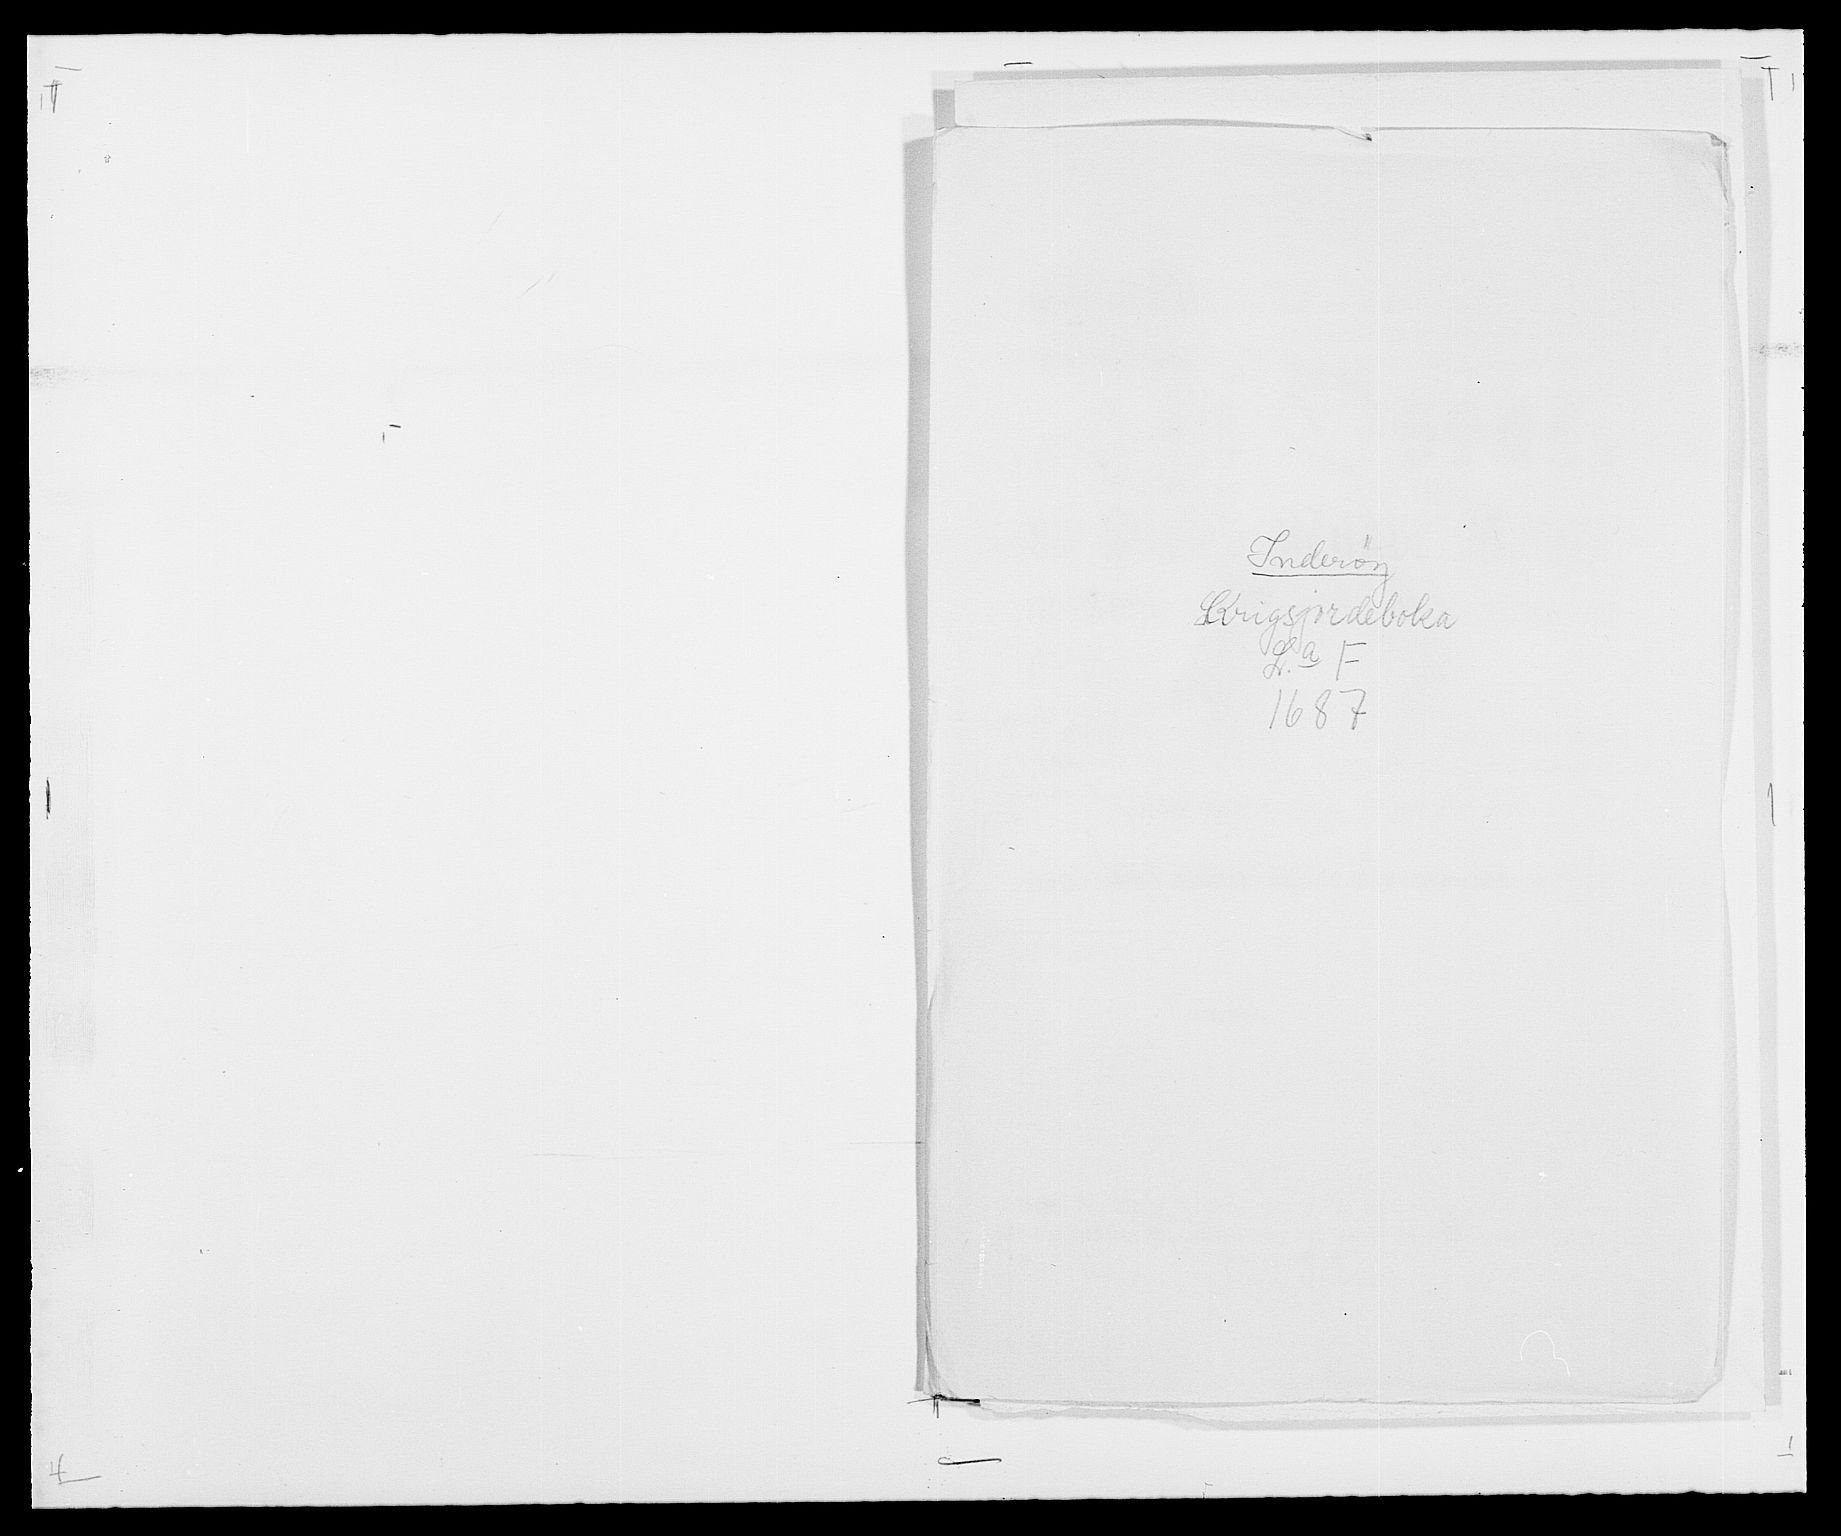 RA, Rentekammeret inntil 1814, Reviderte regnskaper, Fogderegnskap, R63/L4306: Fogderegnskap Inderøy, 1687-1689, s. 92